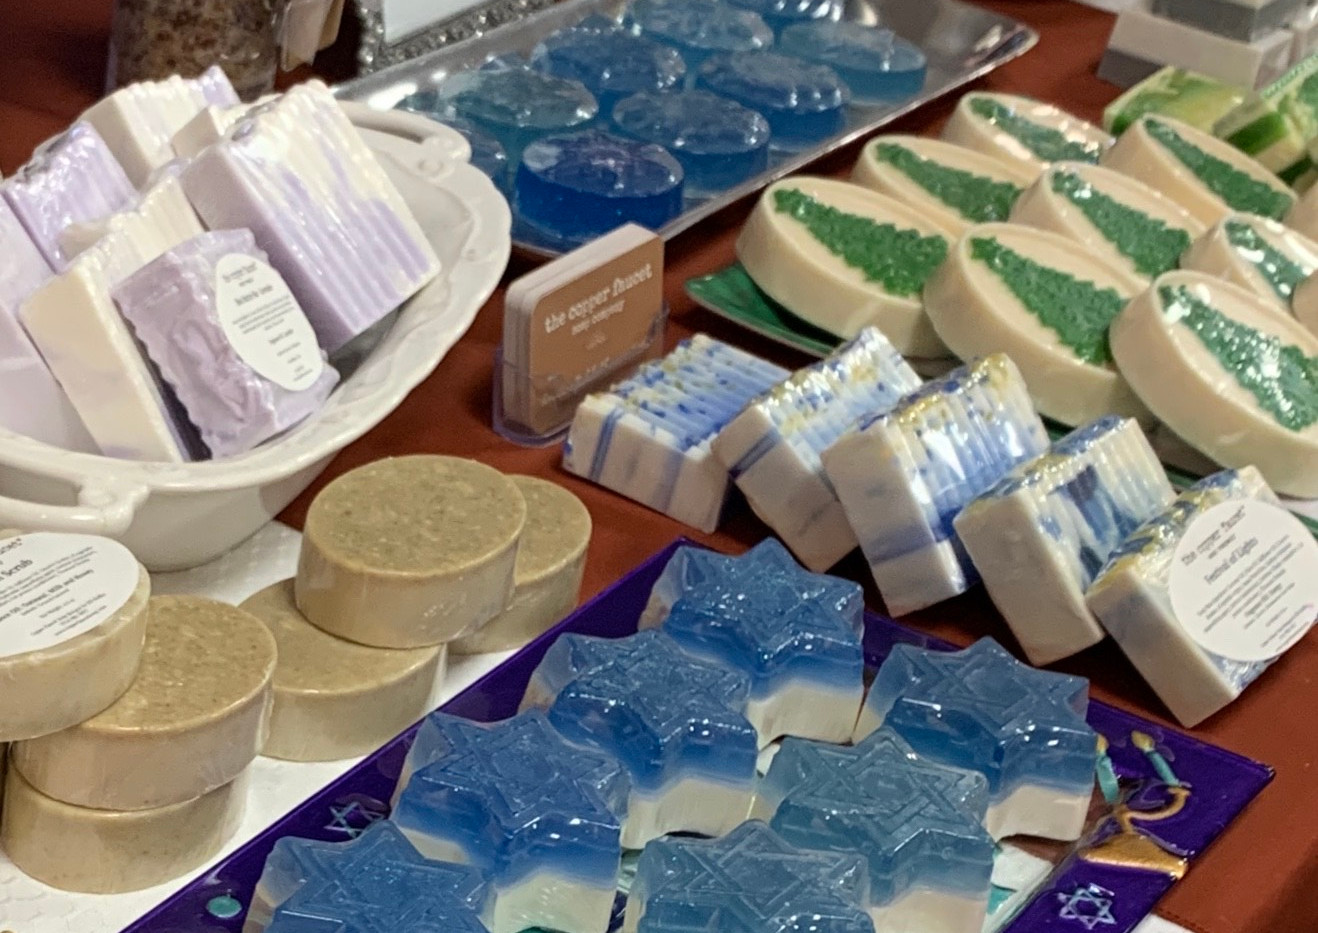 The Copper Faucet Soap Company - New